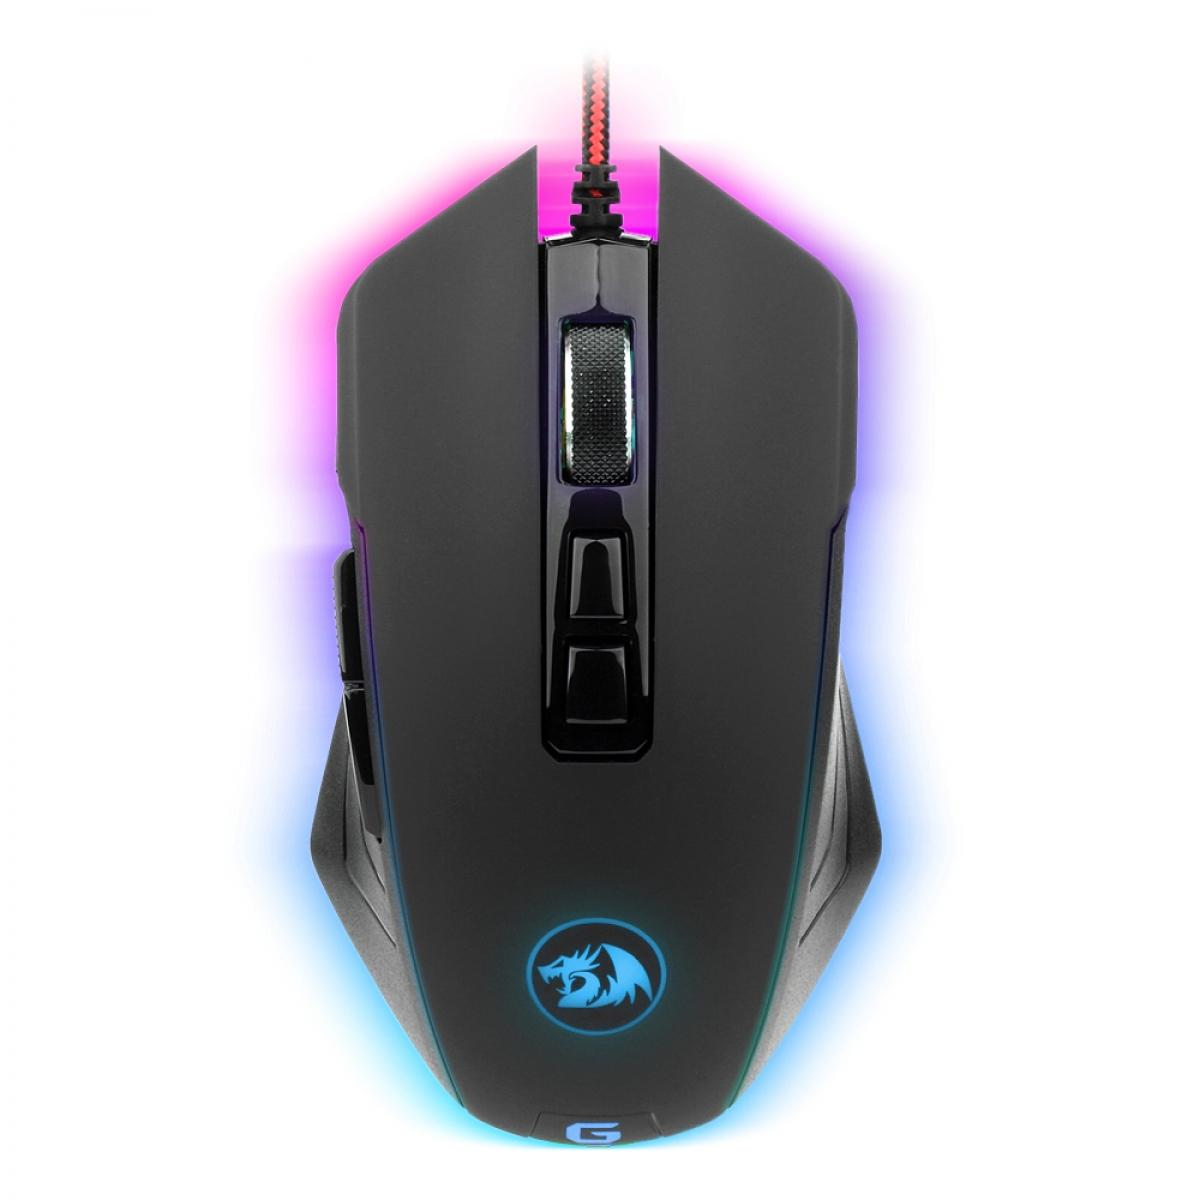 Mouse Gamer Redragon Dagger Chroma M715 RGB, 10000 DPI, 7 Botões Programáveis, Black